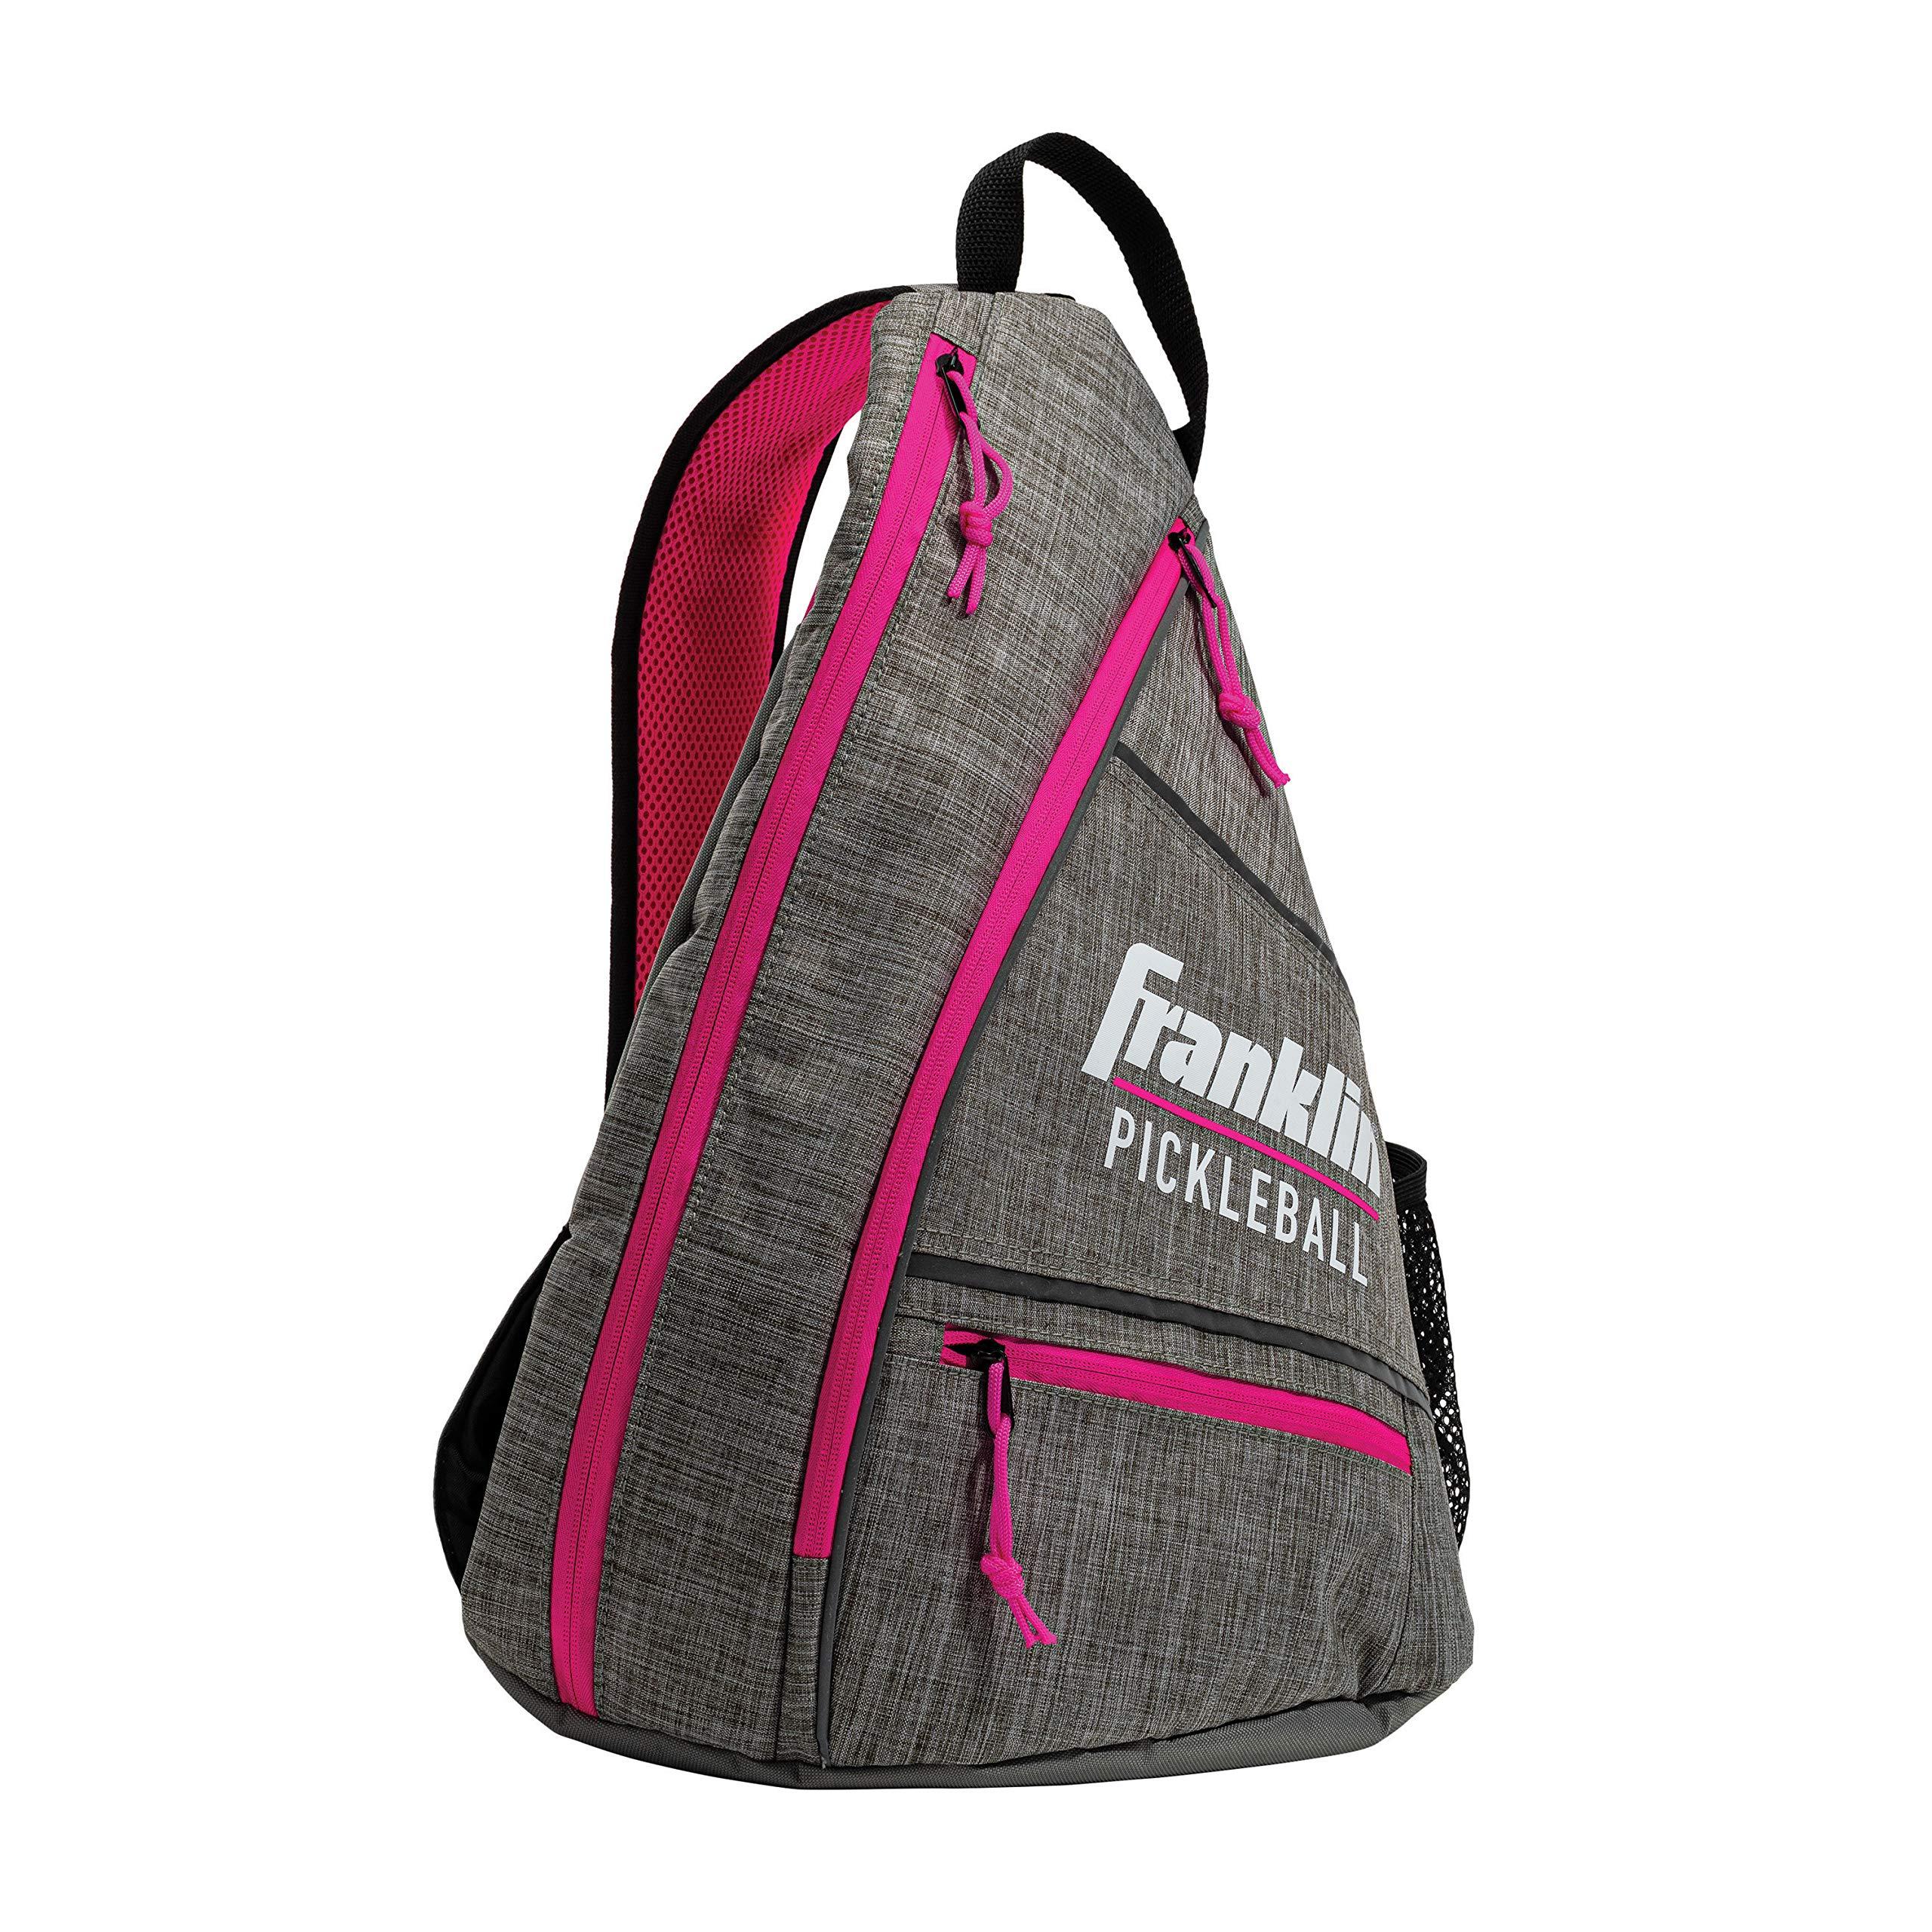 Franklin Sports Pickleball Bag - Men's and Women's Pickleball Backpack - Adjustable Sling Bag - Official Bag of U.S Open Pickleball Championships - Gray/Pink by Franklin Sports